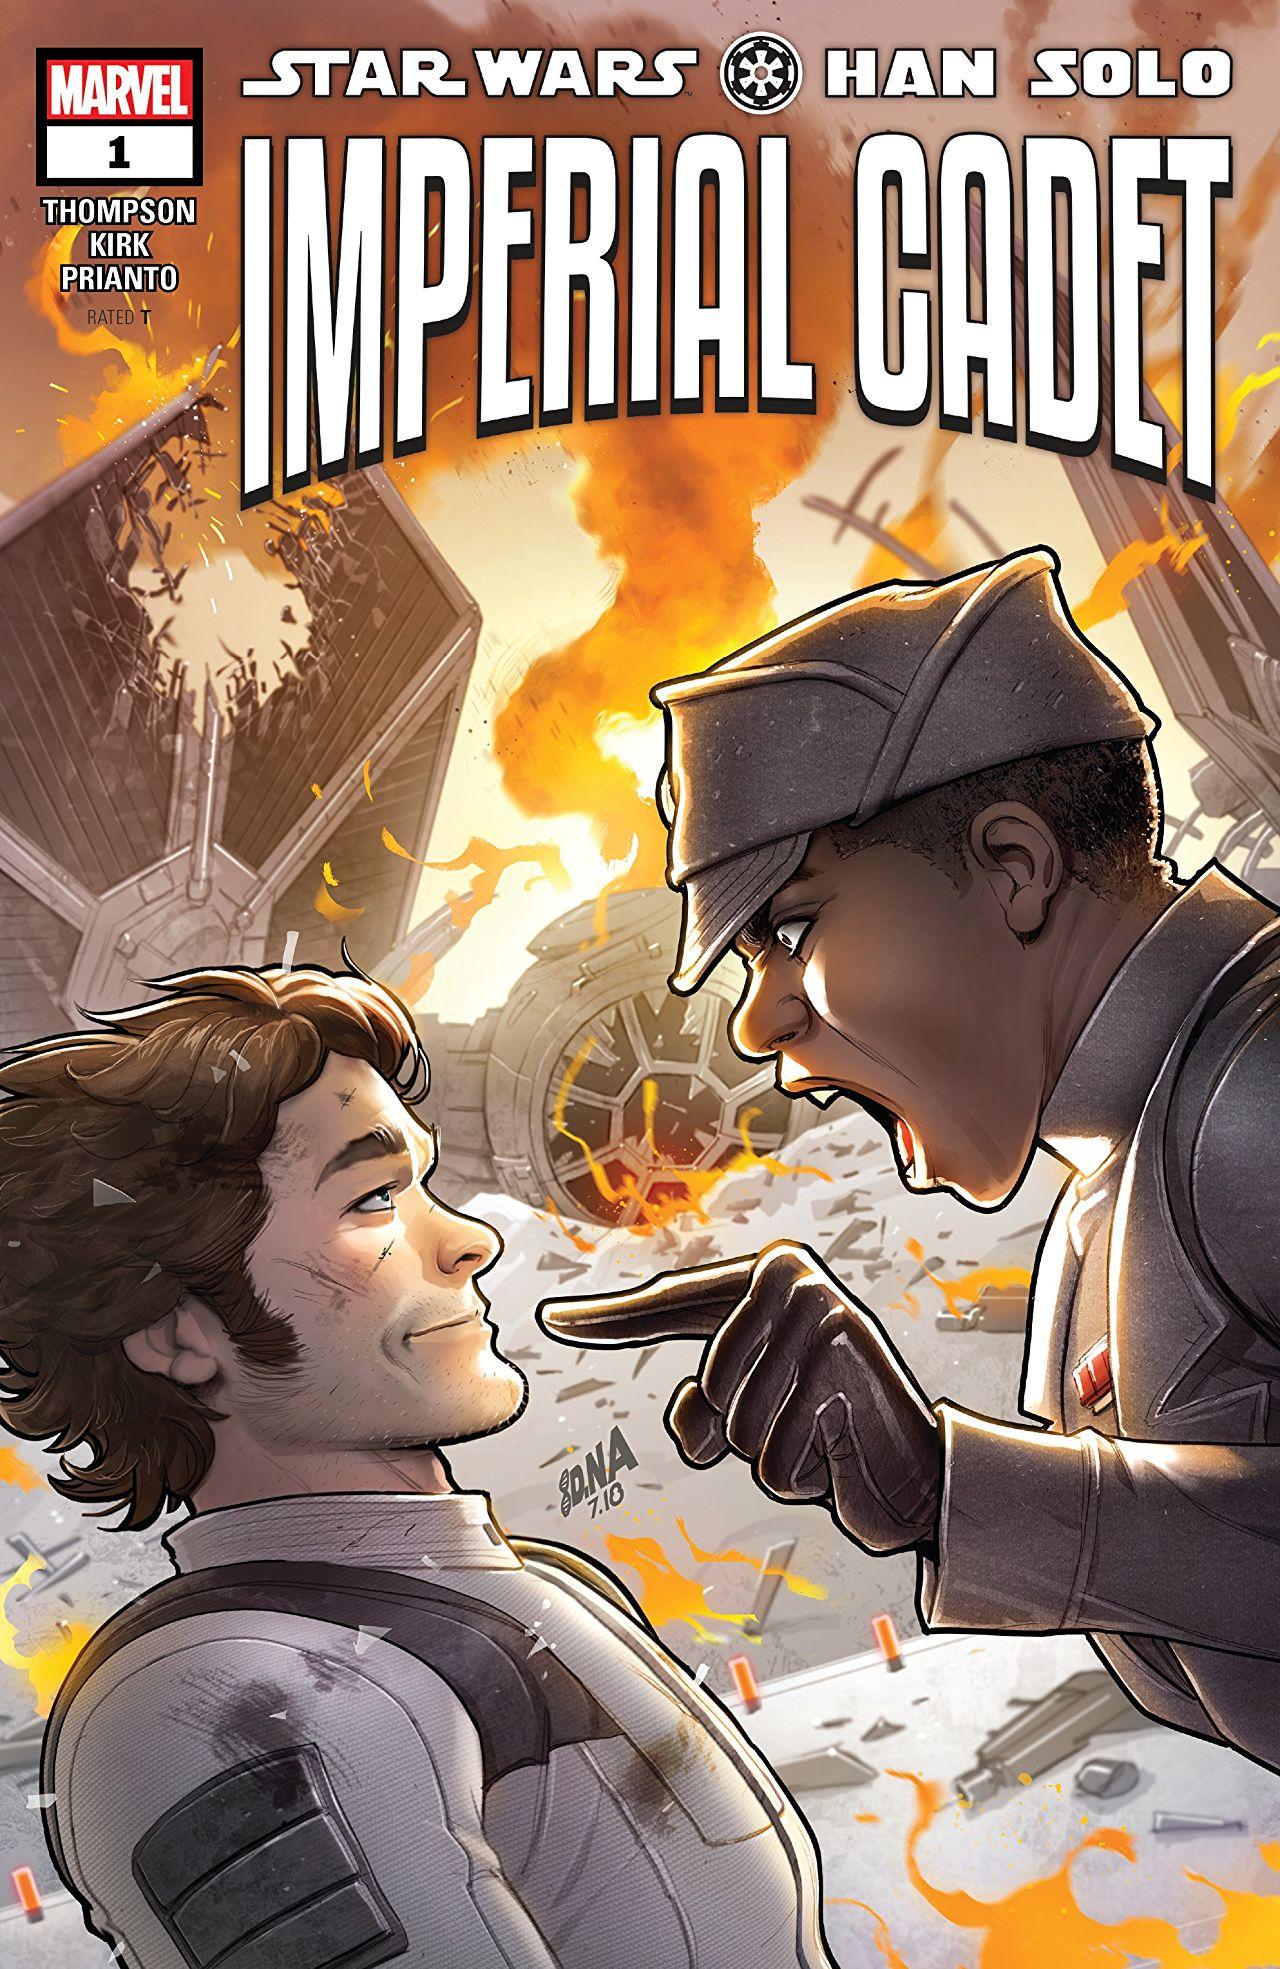 Star Wars - Han Solo - Imperial Cadet 1